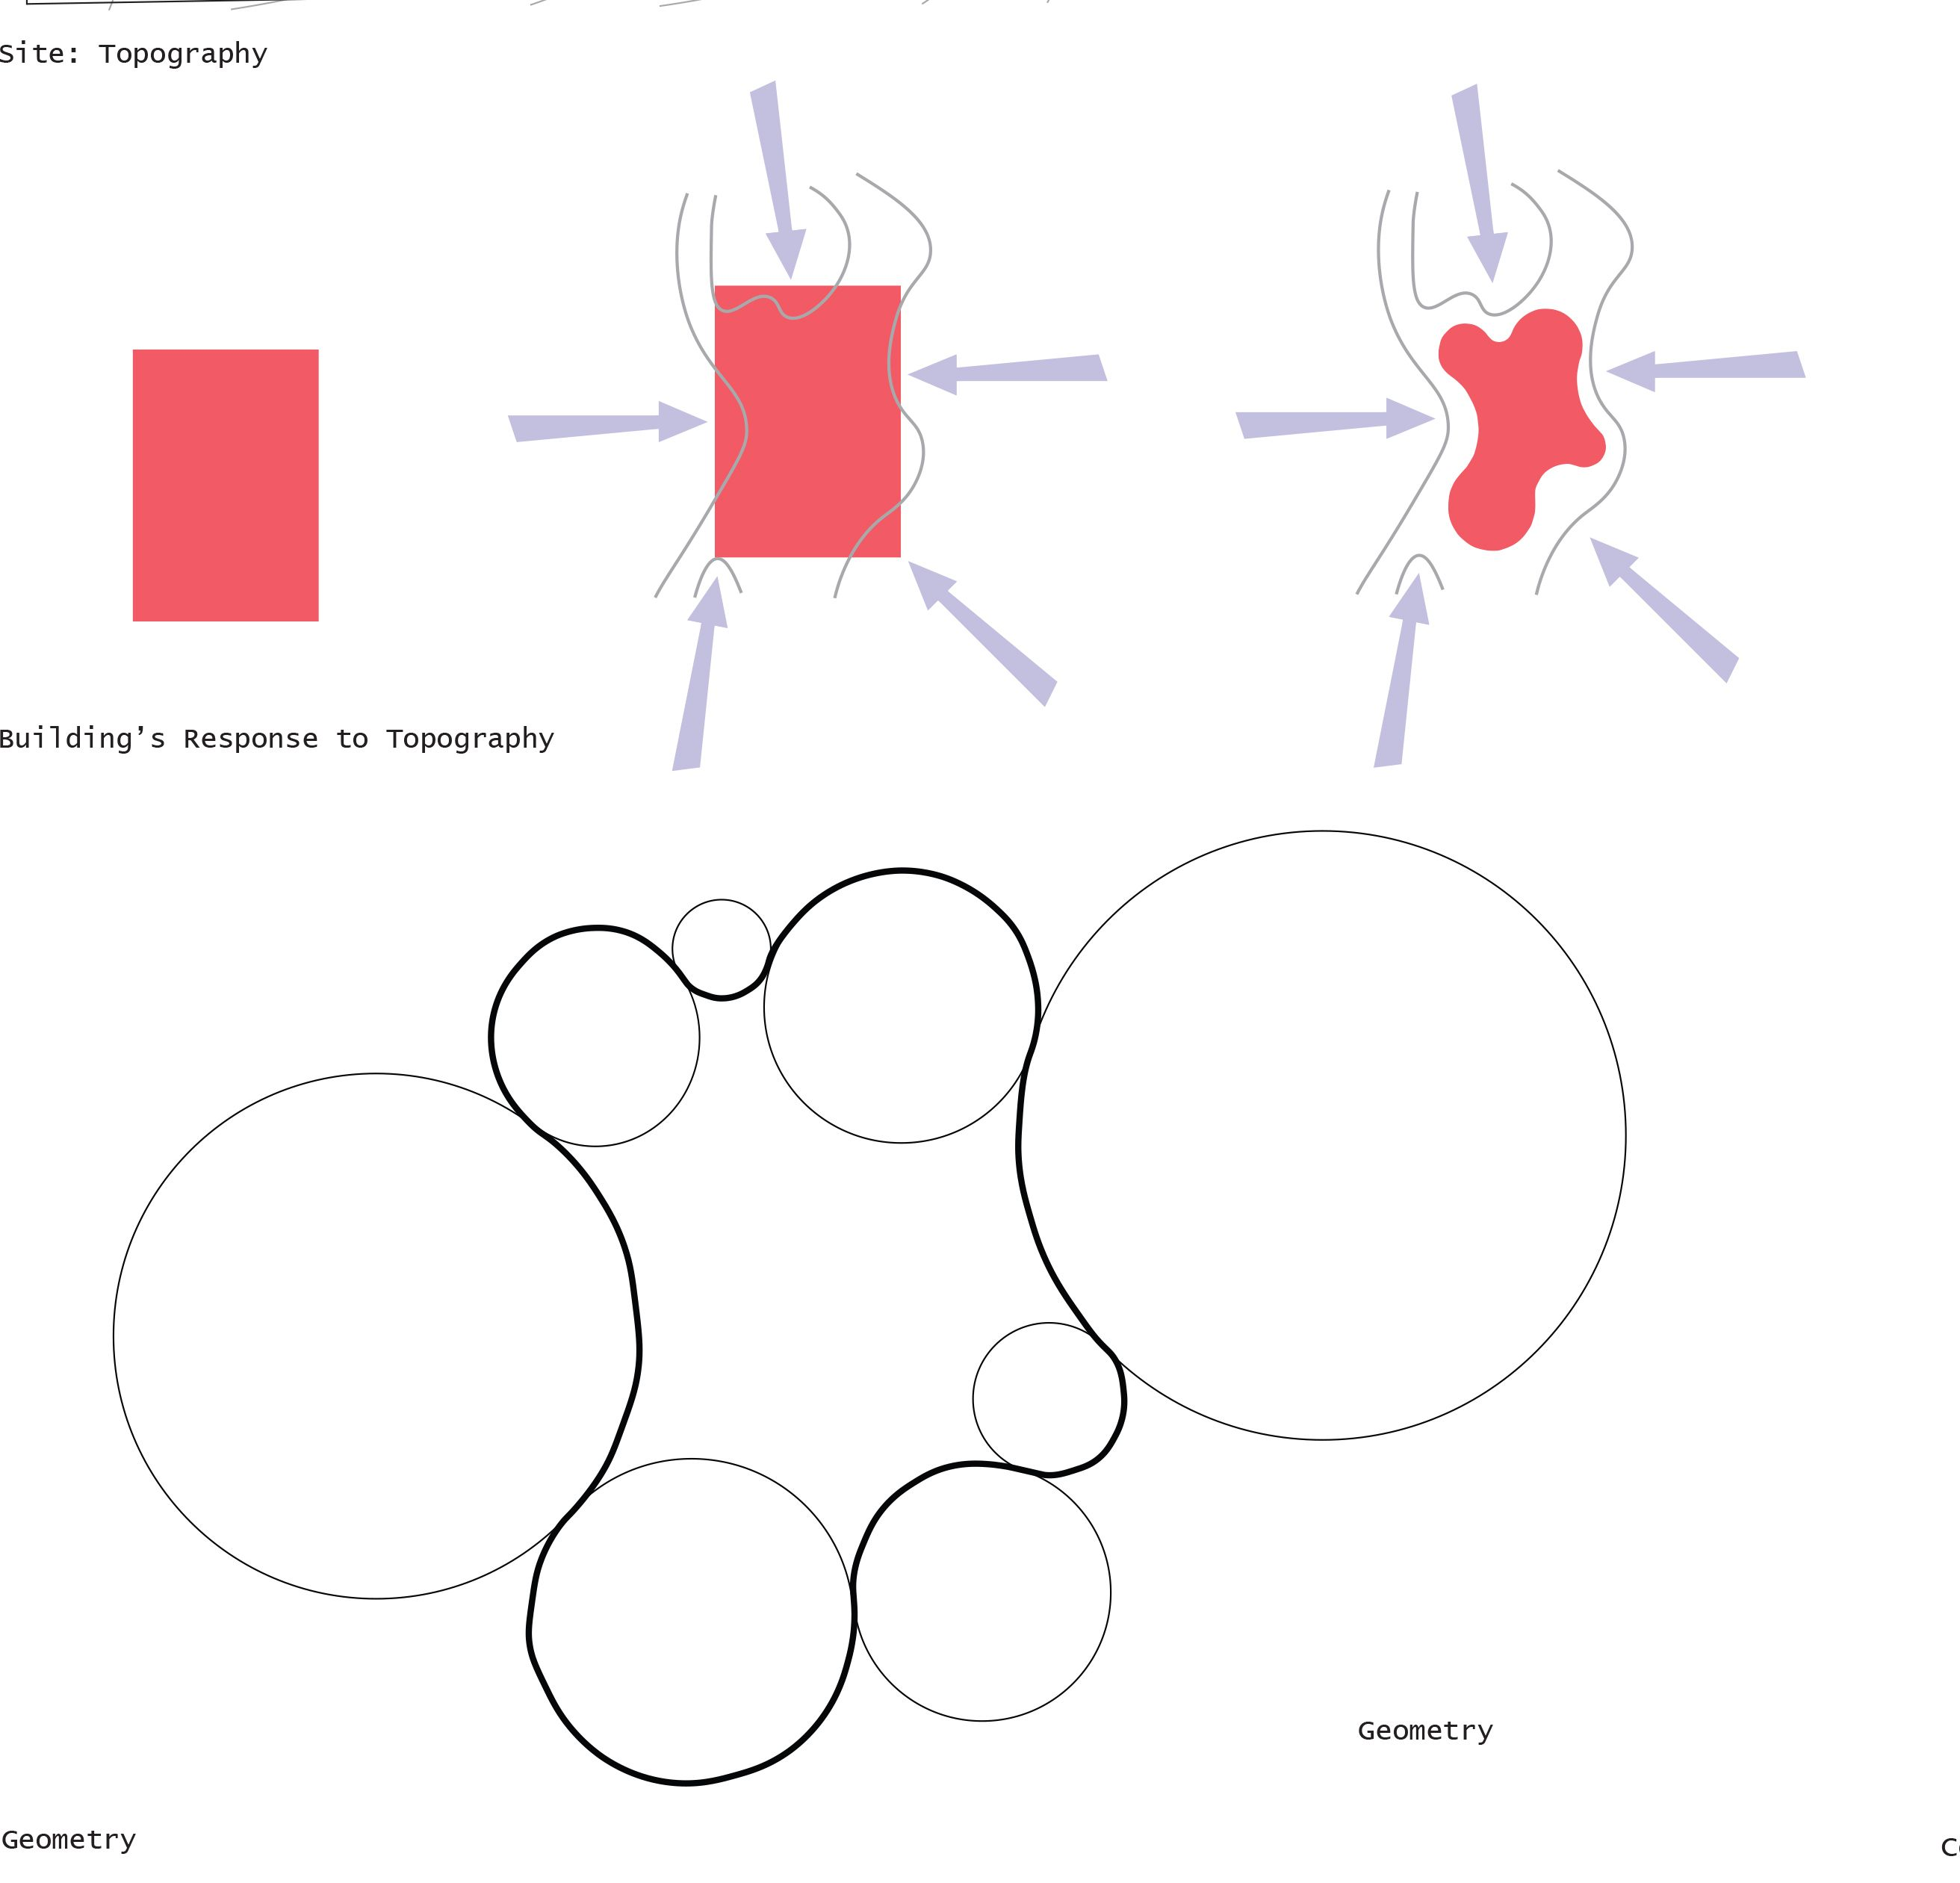 Great  p Cottbus University Library IKMZ Herzog u de Mueron Diagrams Reaction to Topography and